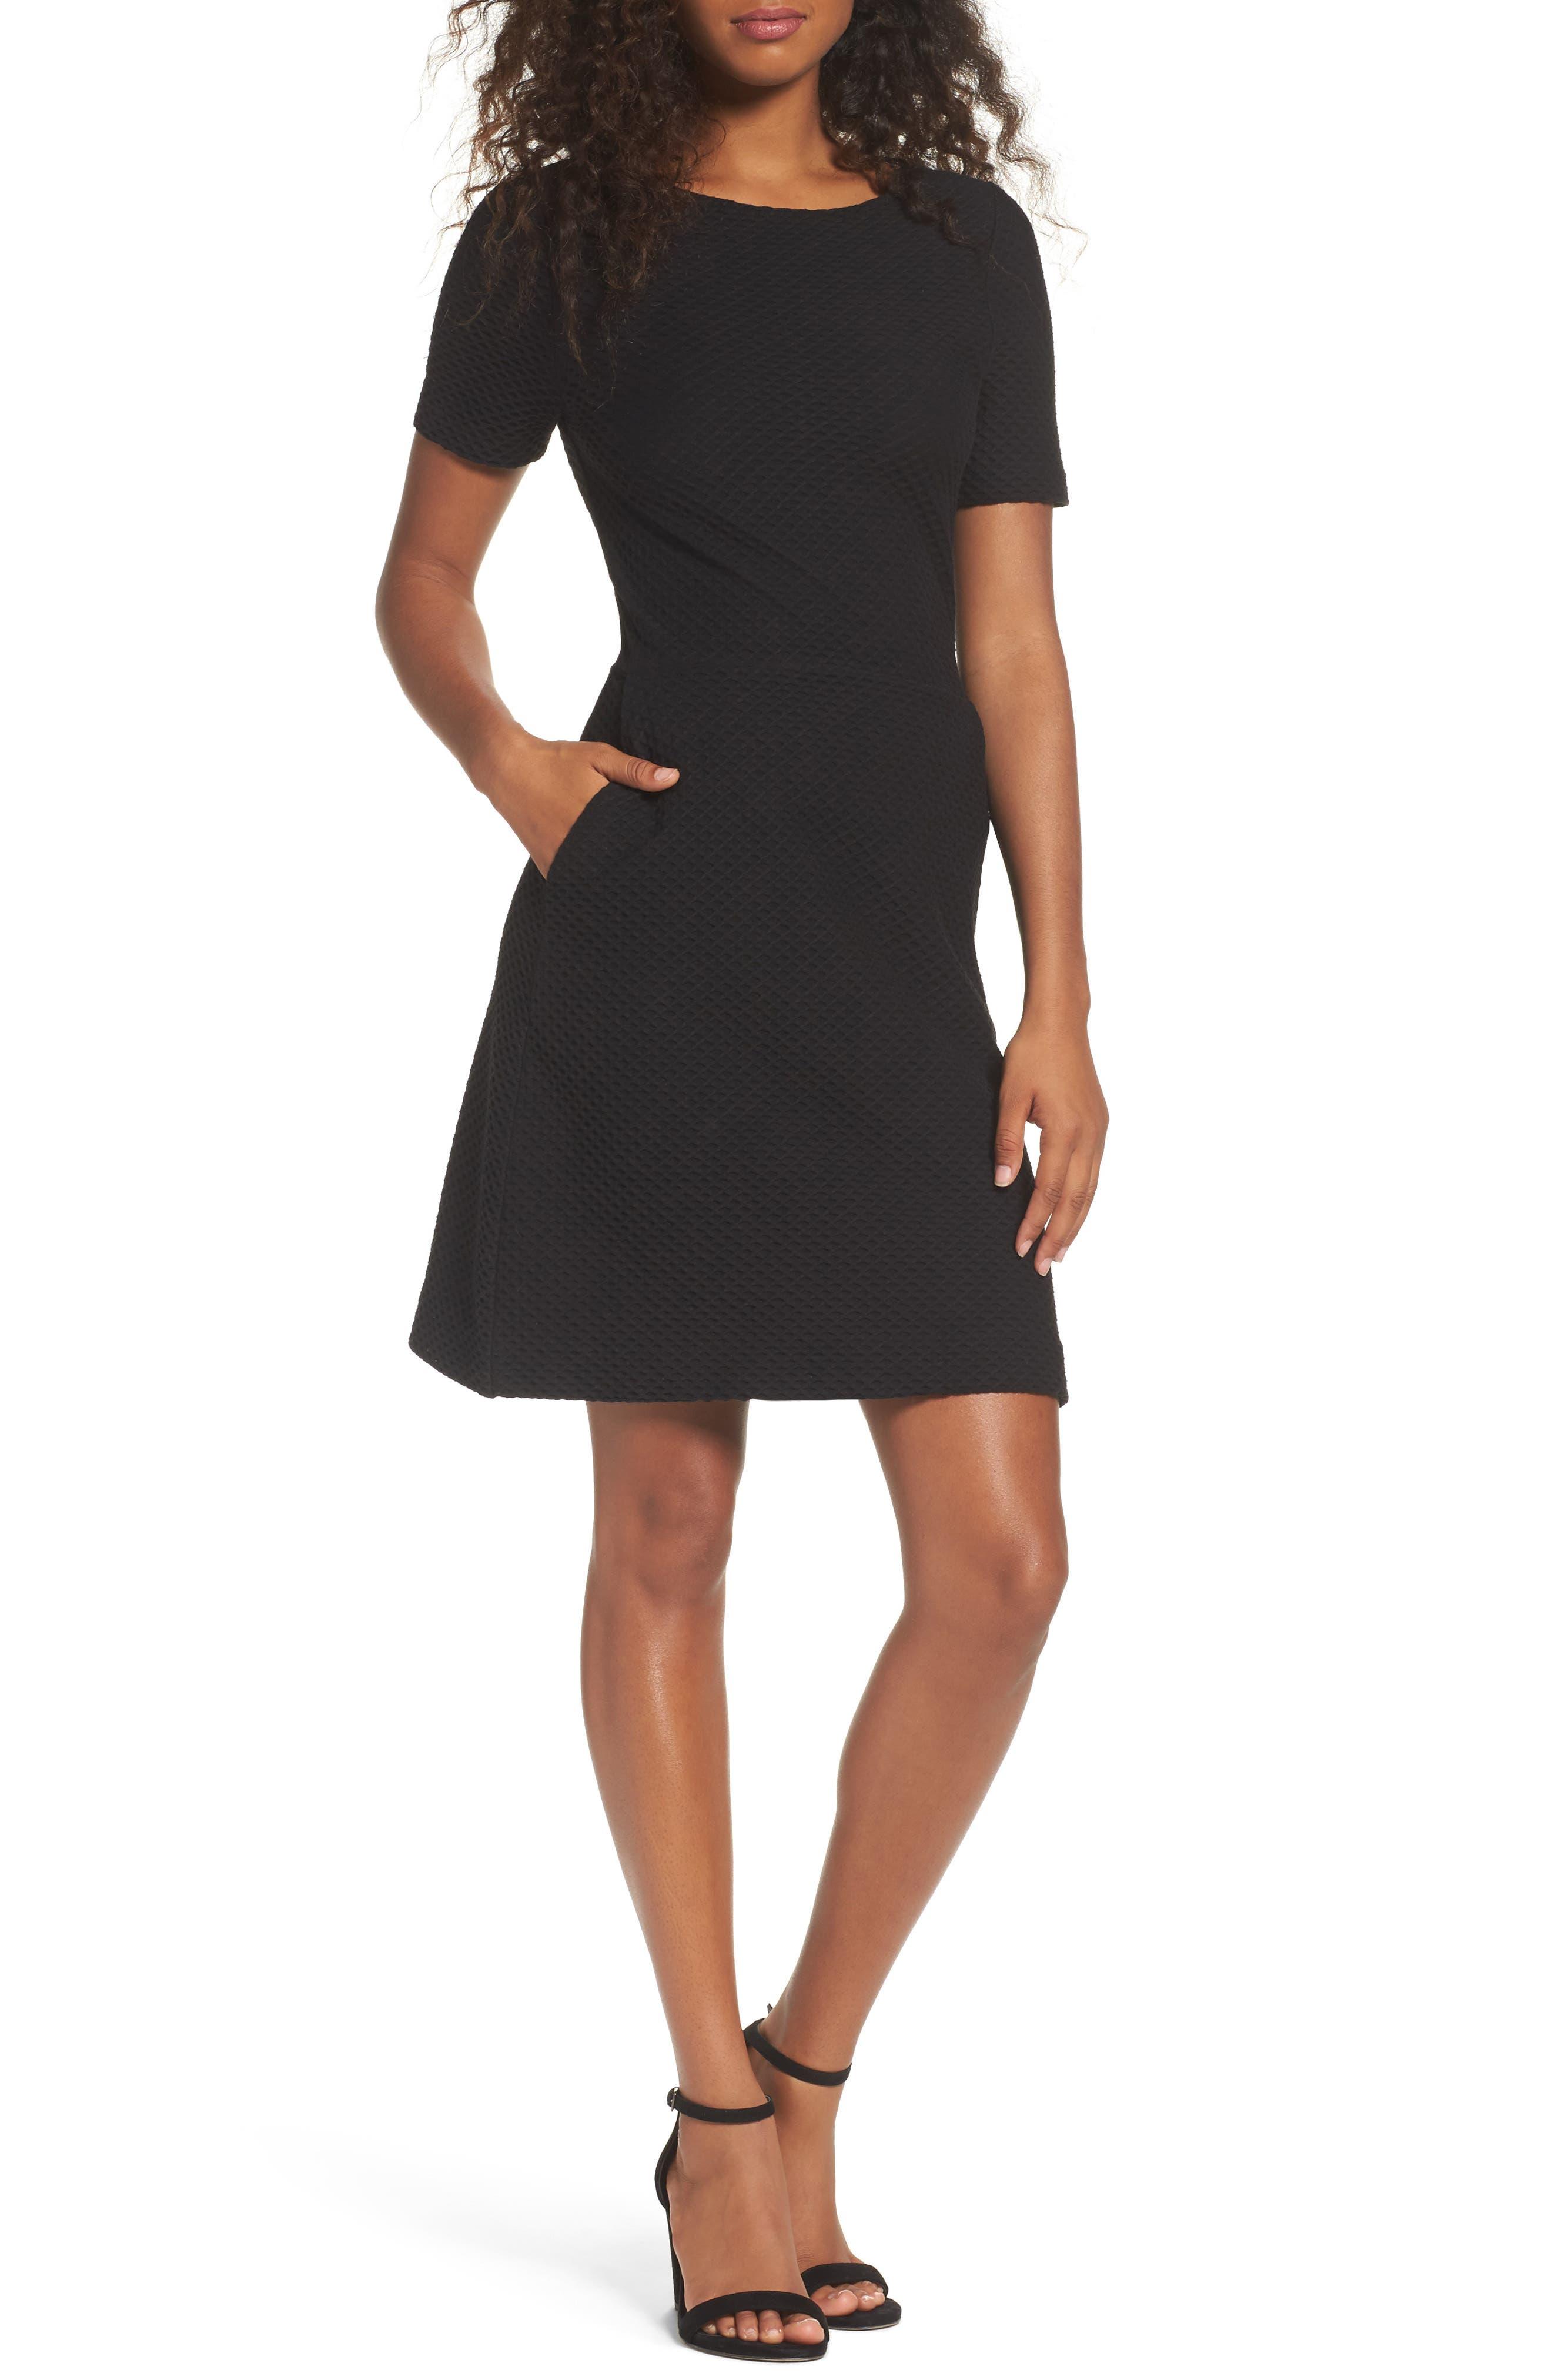 Sale alerts for  Dixie Fit & Flare Dress - Covvet